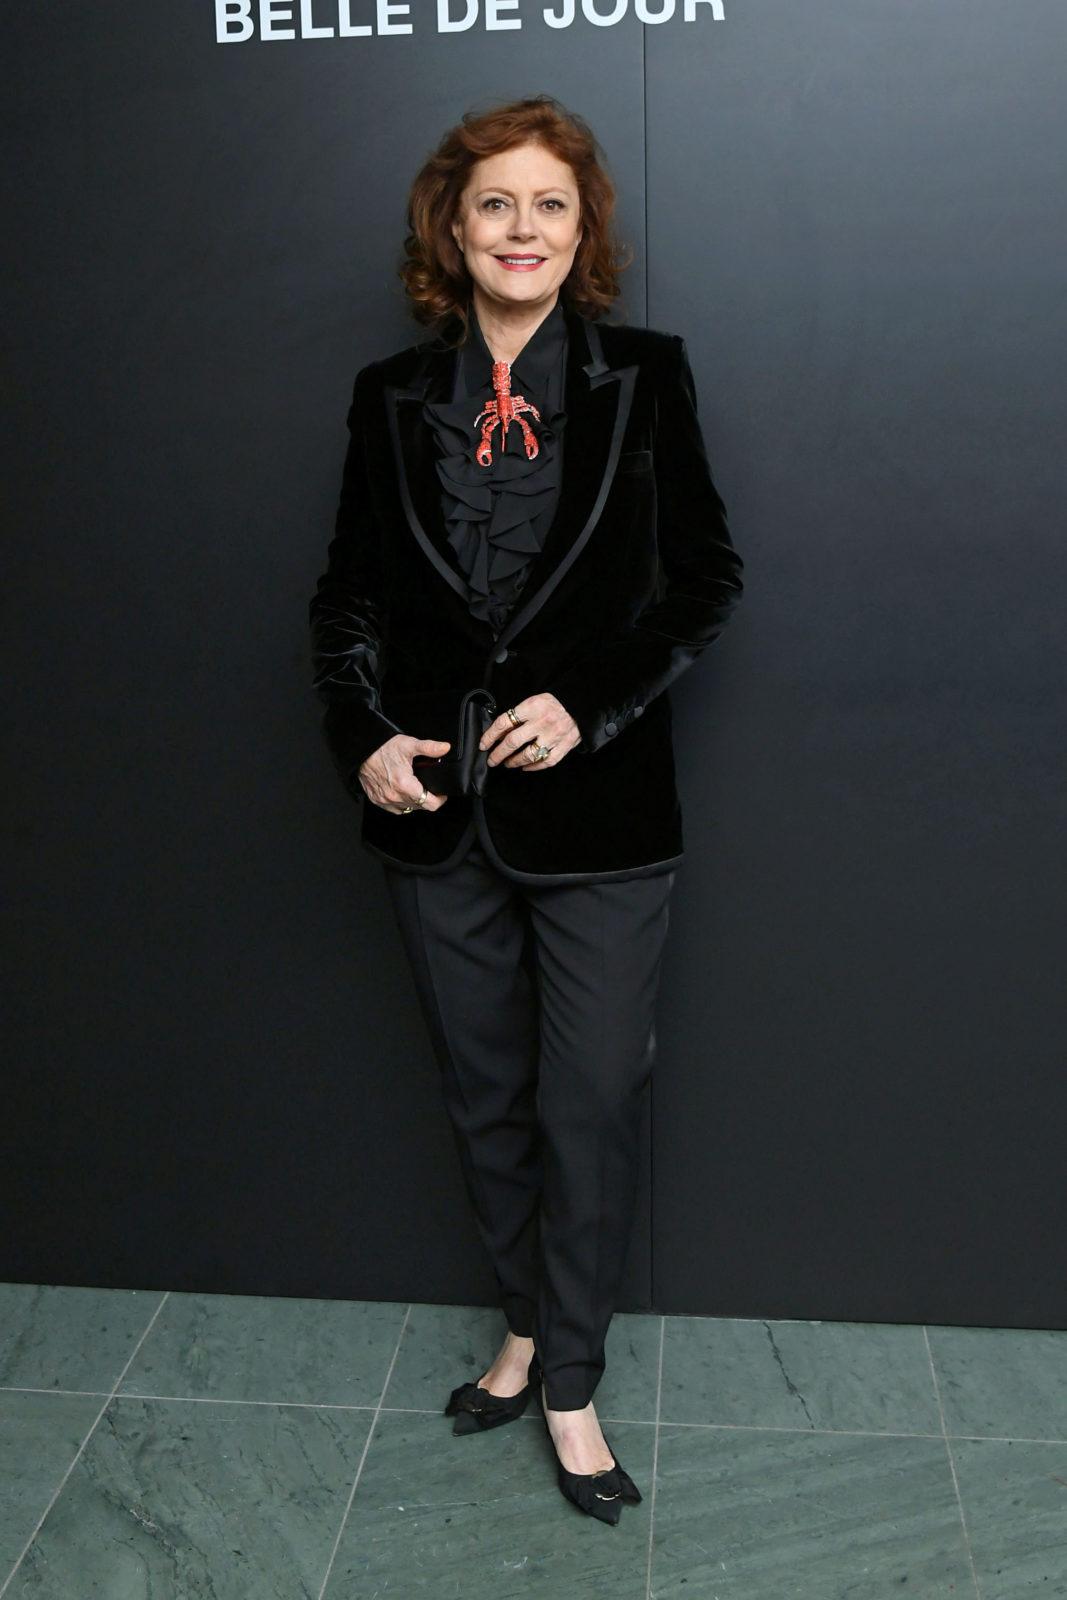 Susan Sarandon looked gorgeous as the recent Saint Laurent Presents 'Belle De Jour' 50th Anniversary Screening.